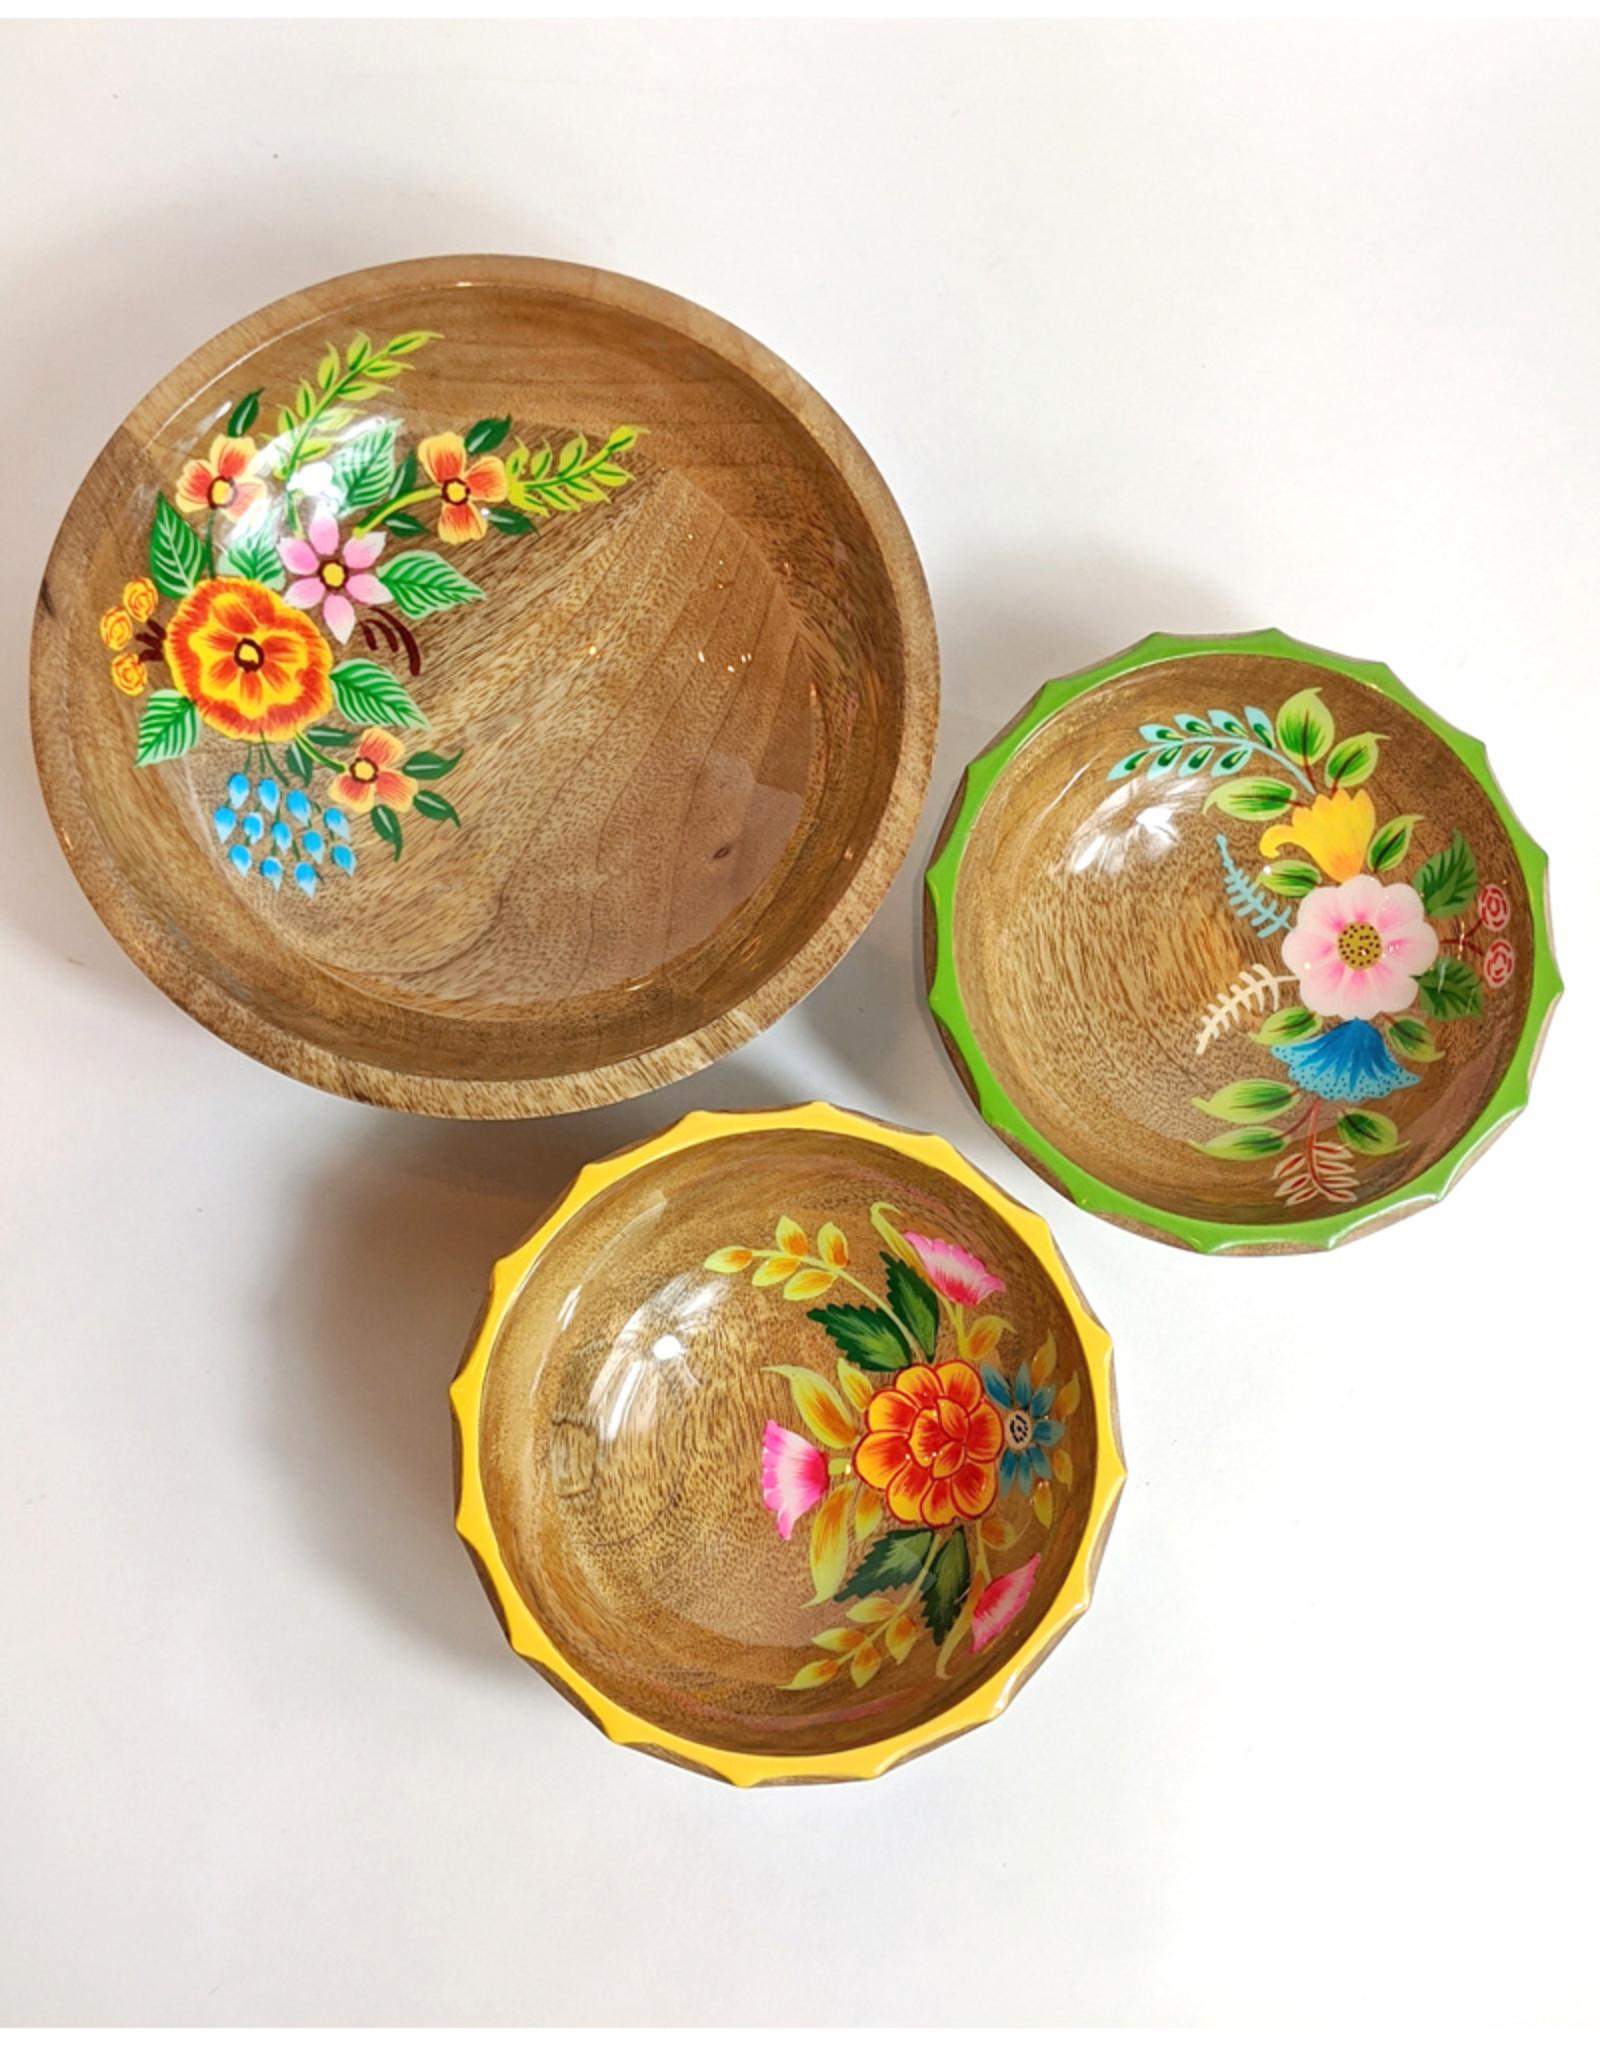 One Hundred 80 Degrees Hand Painted Flower Bowl